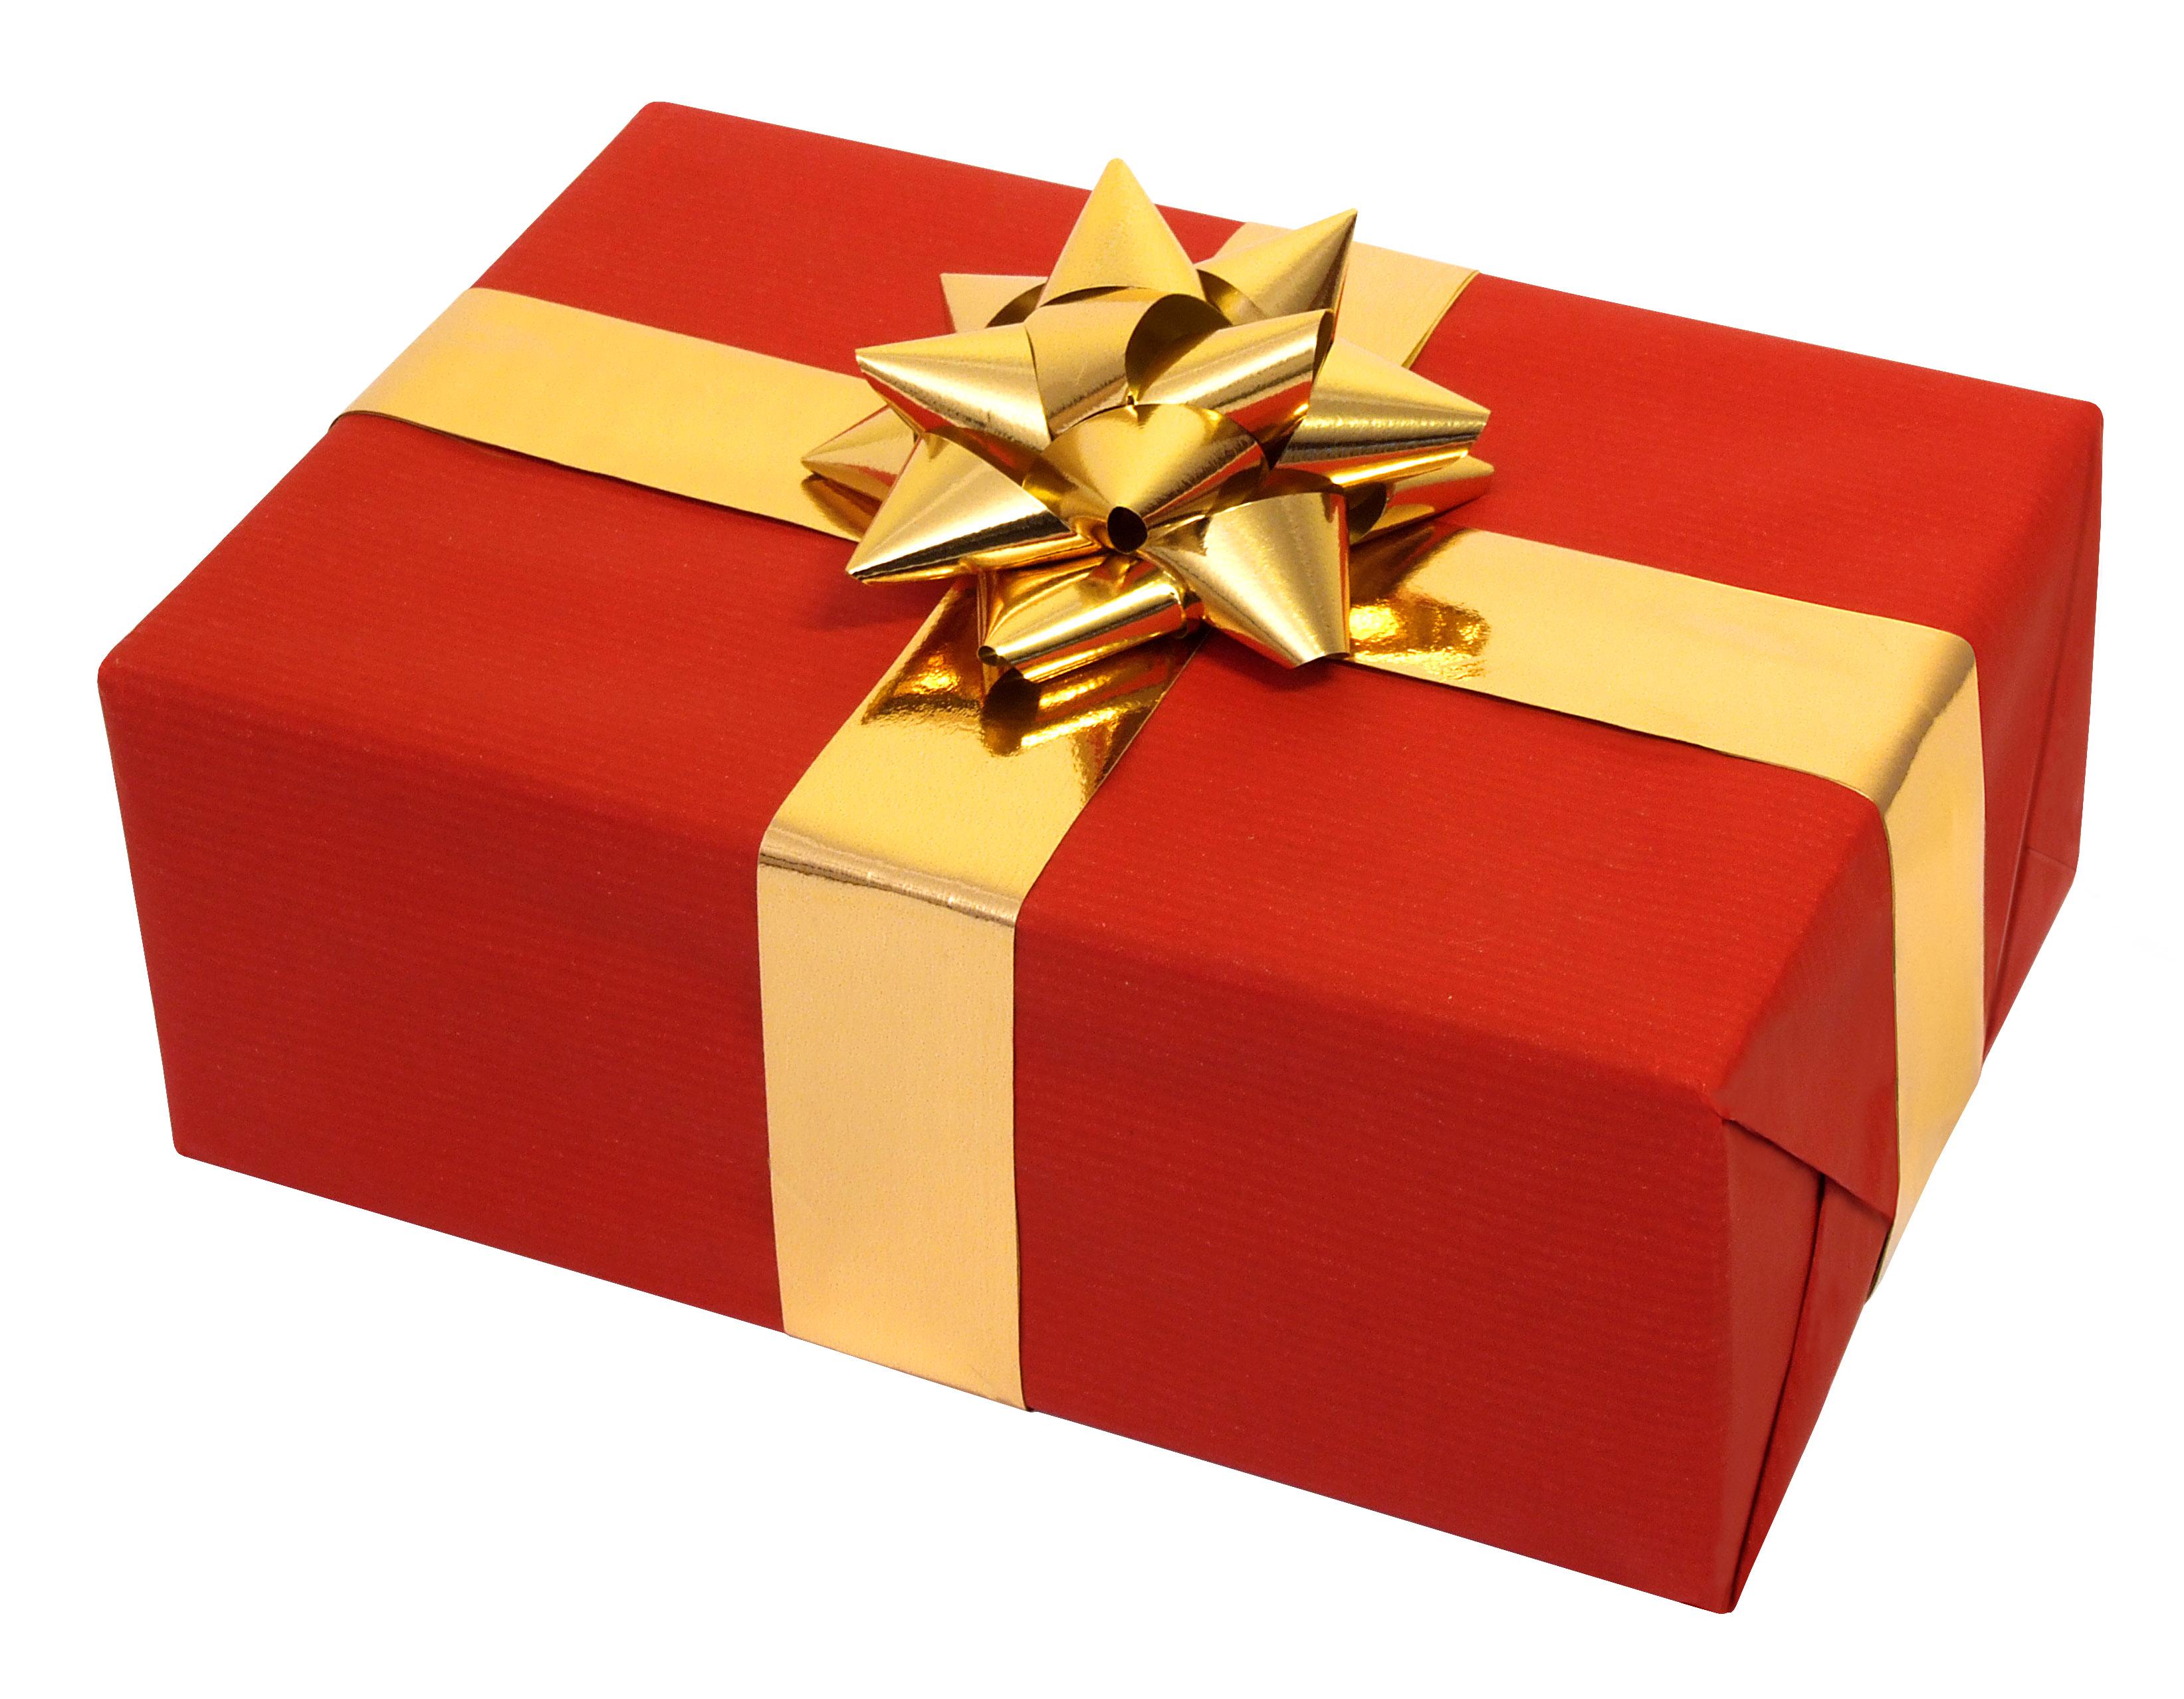 Return Gifts Culture in Weddings